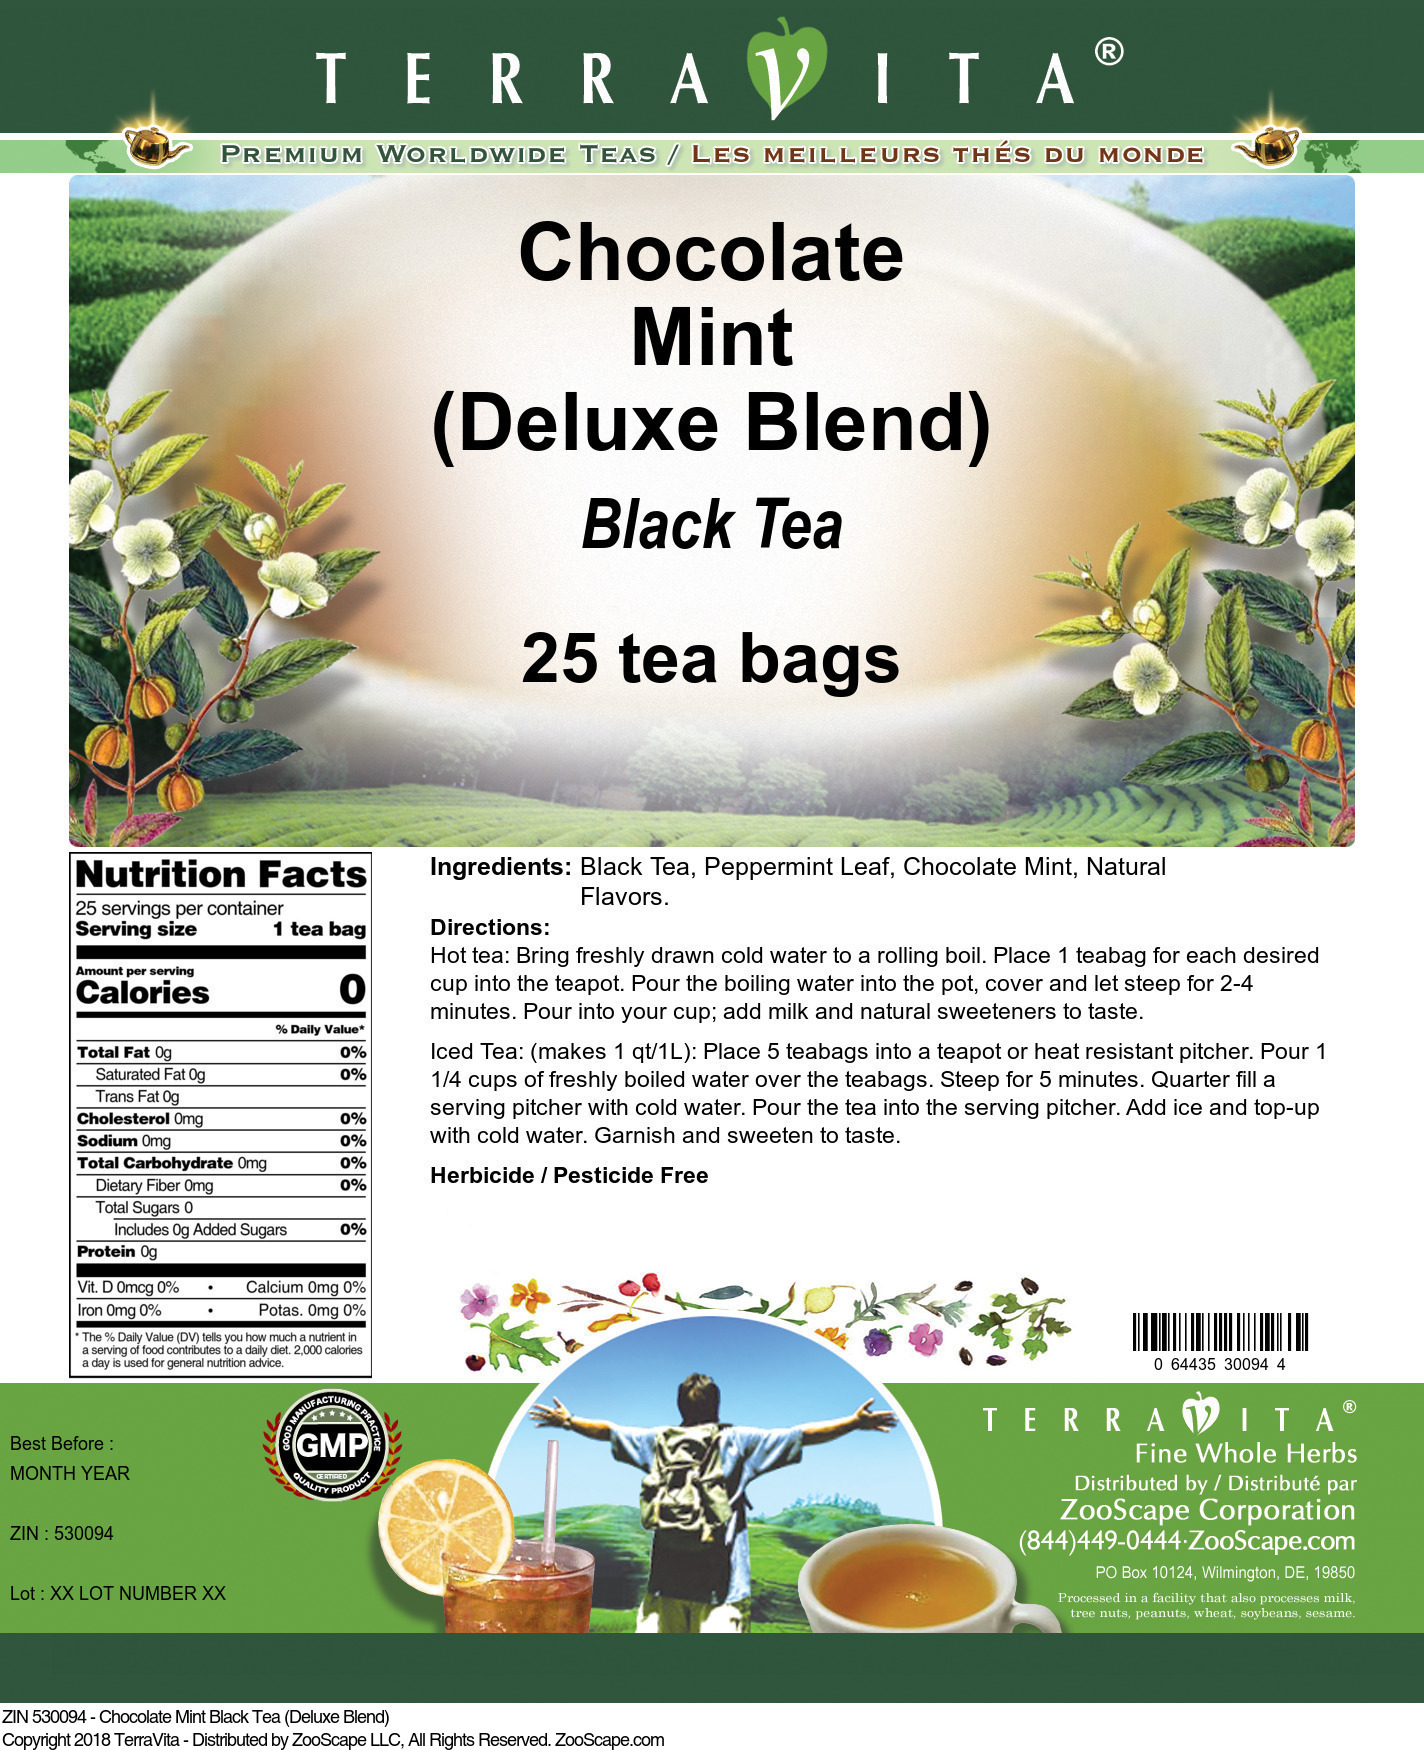 Chocolate Mint Black Tea (Deluxe Blend)